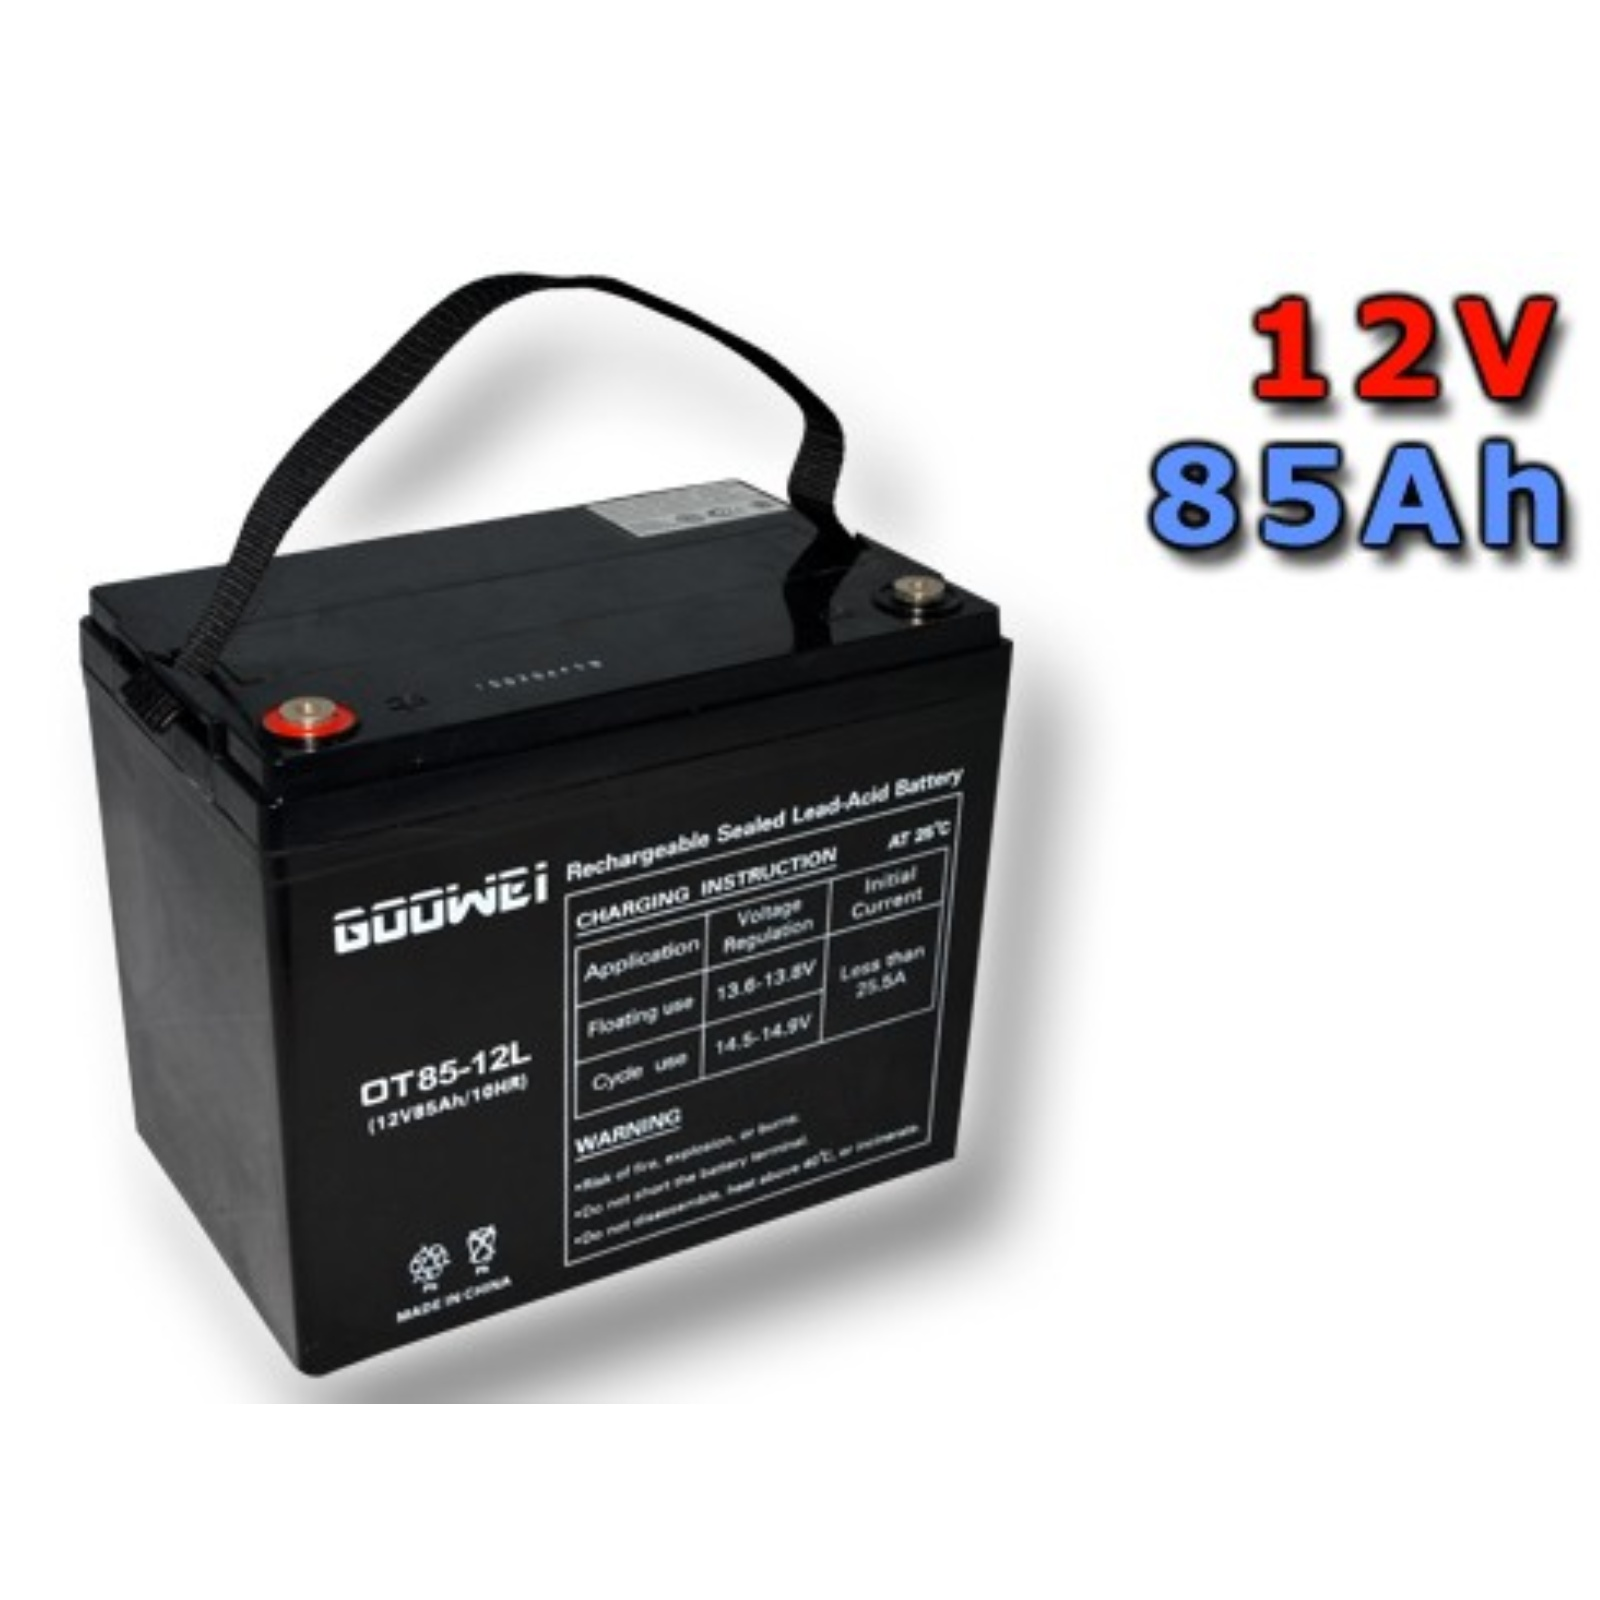 Trakční gelová baterie GOOWEI OTL85-12 85Ah